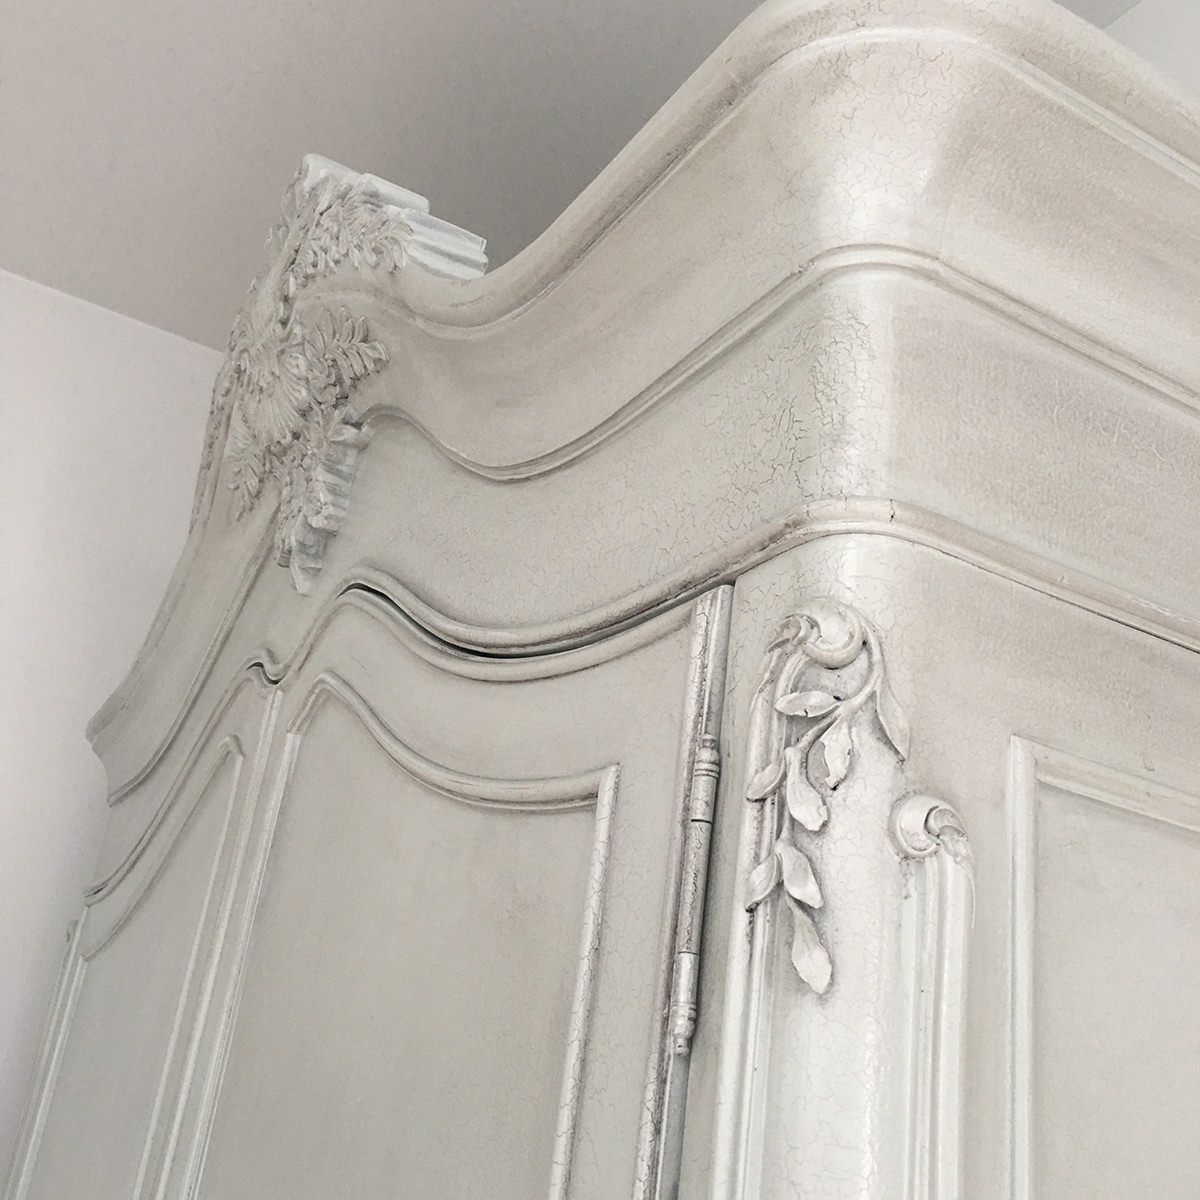 palo-alto-california-french-chateau-shoe-storage-armoire-interior-design-montgomery-home-1.jpg